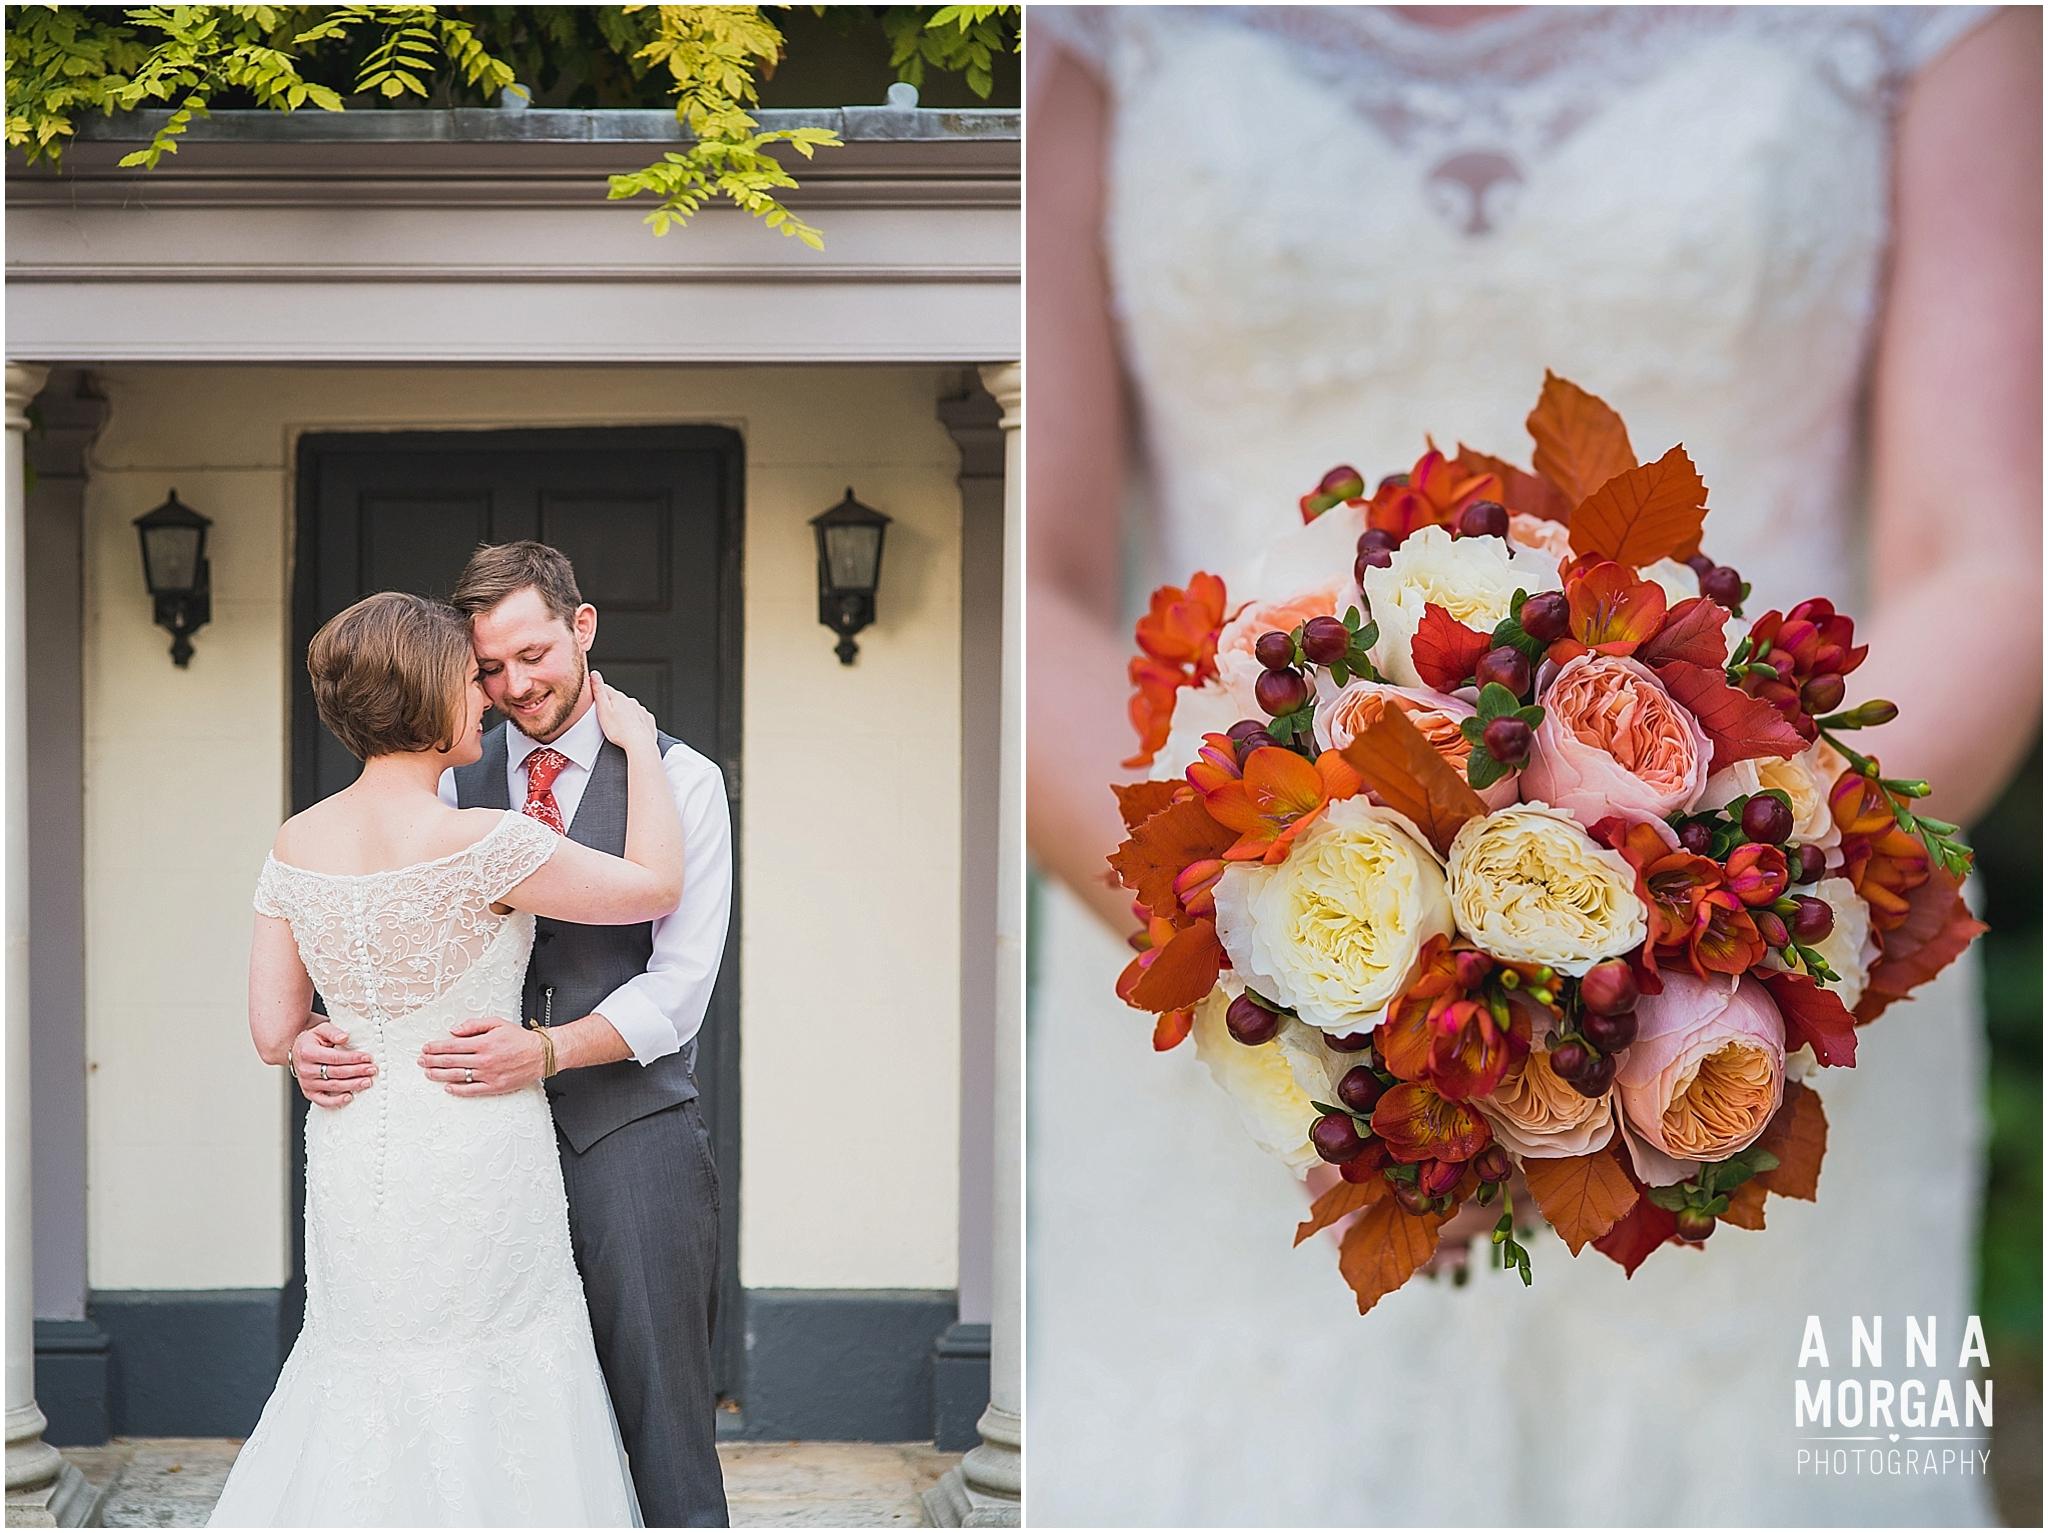 Kate & Ben St Michaels Church & The Lord Bute wedding dorset